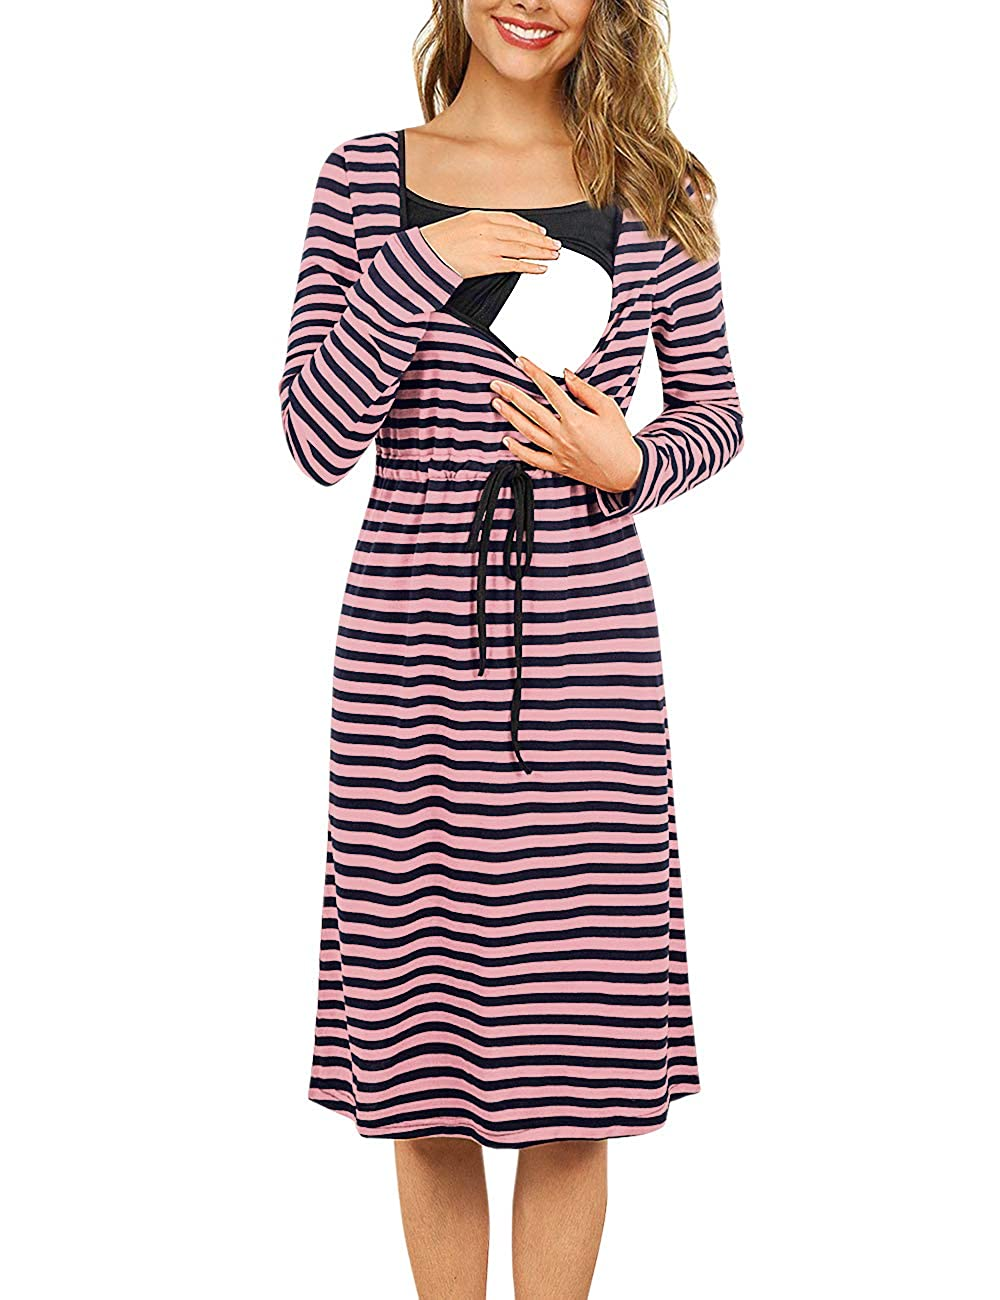 Hellmei Womens Maternity Dress,Empire Waist Nursing Dress for Breastfeeding Knee Length